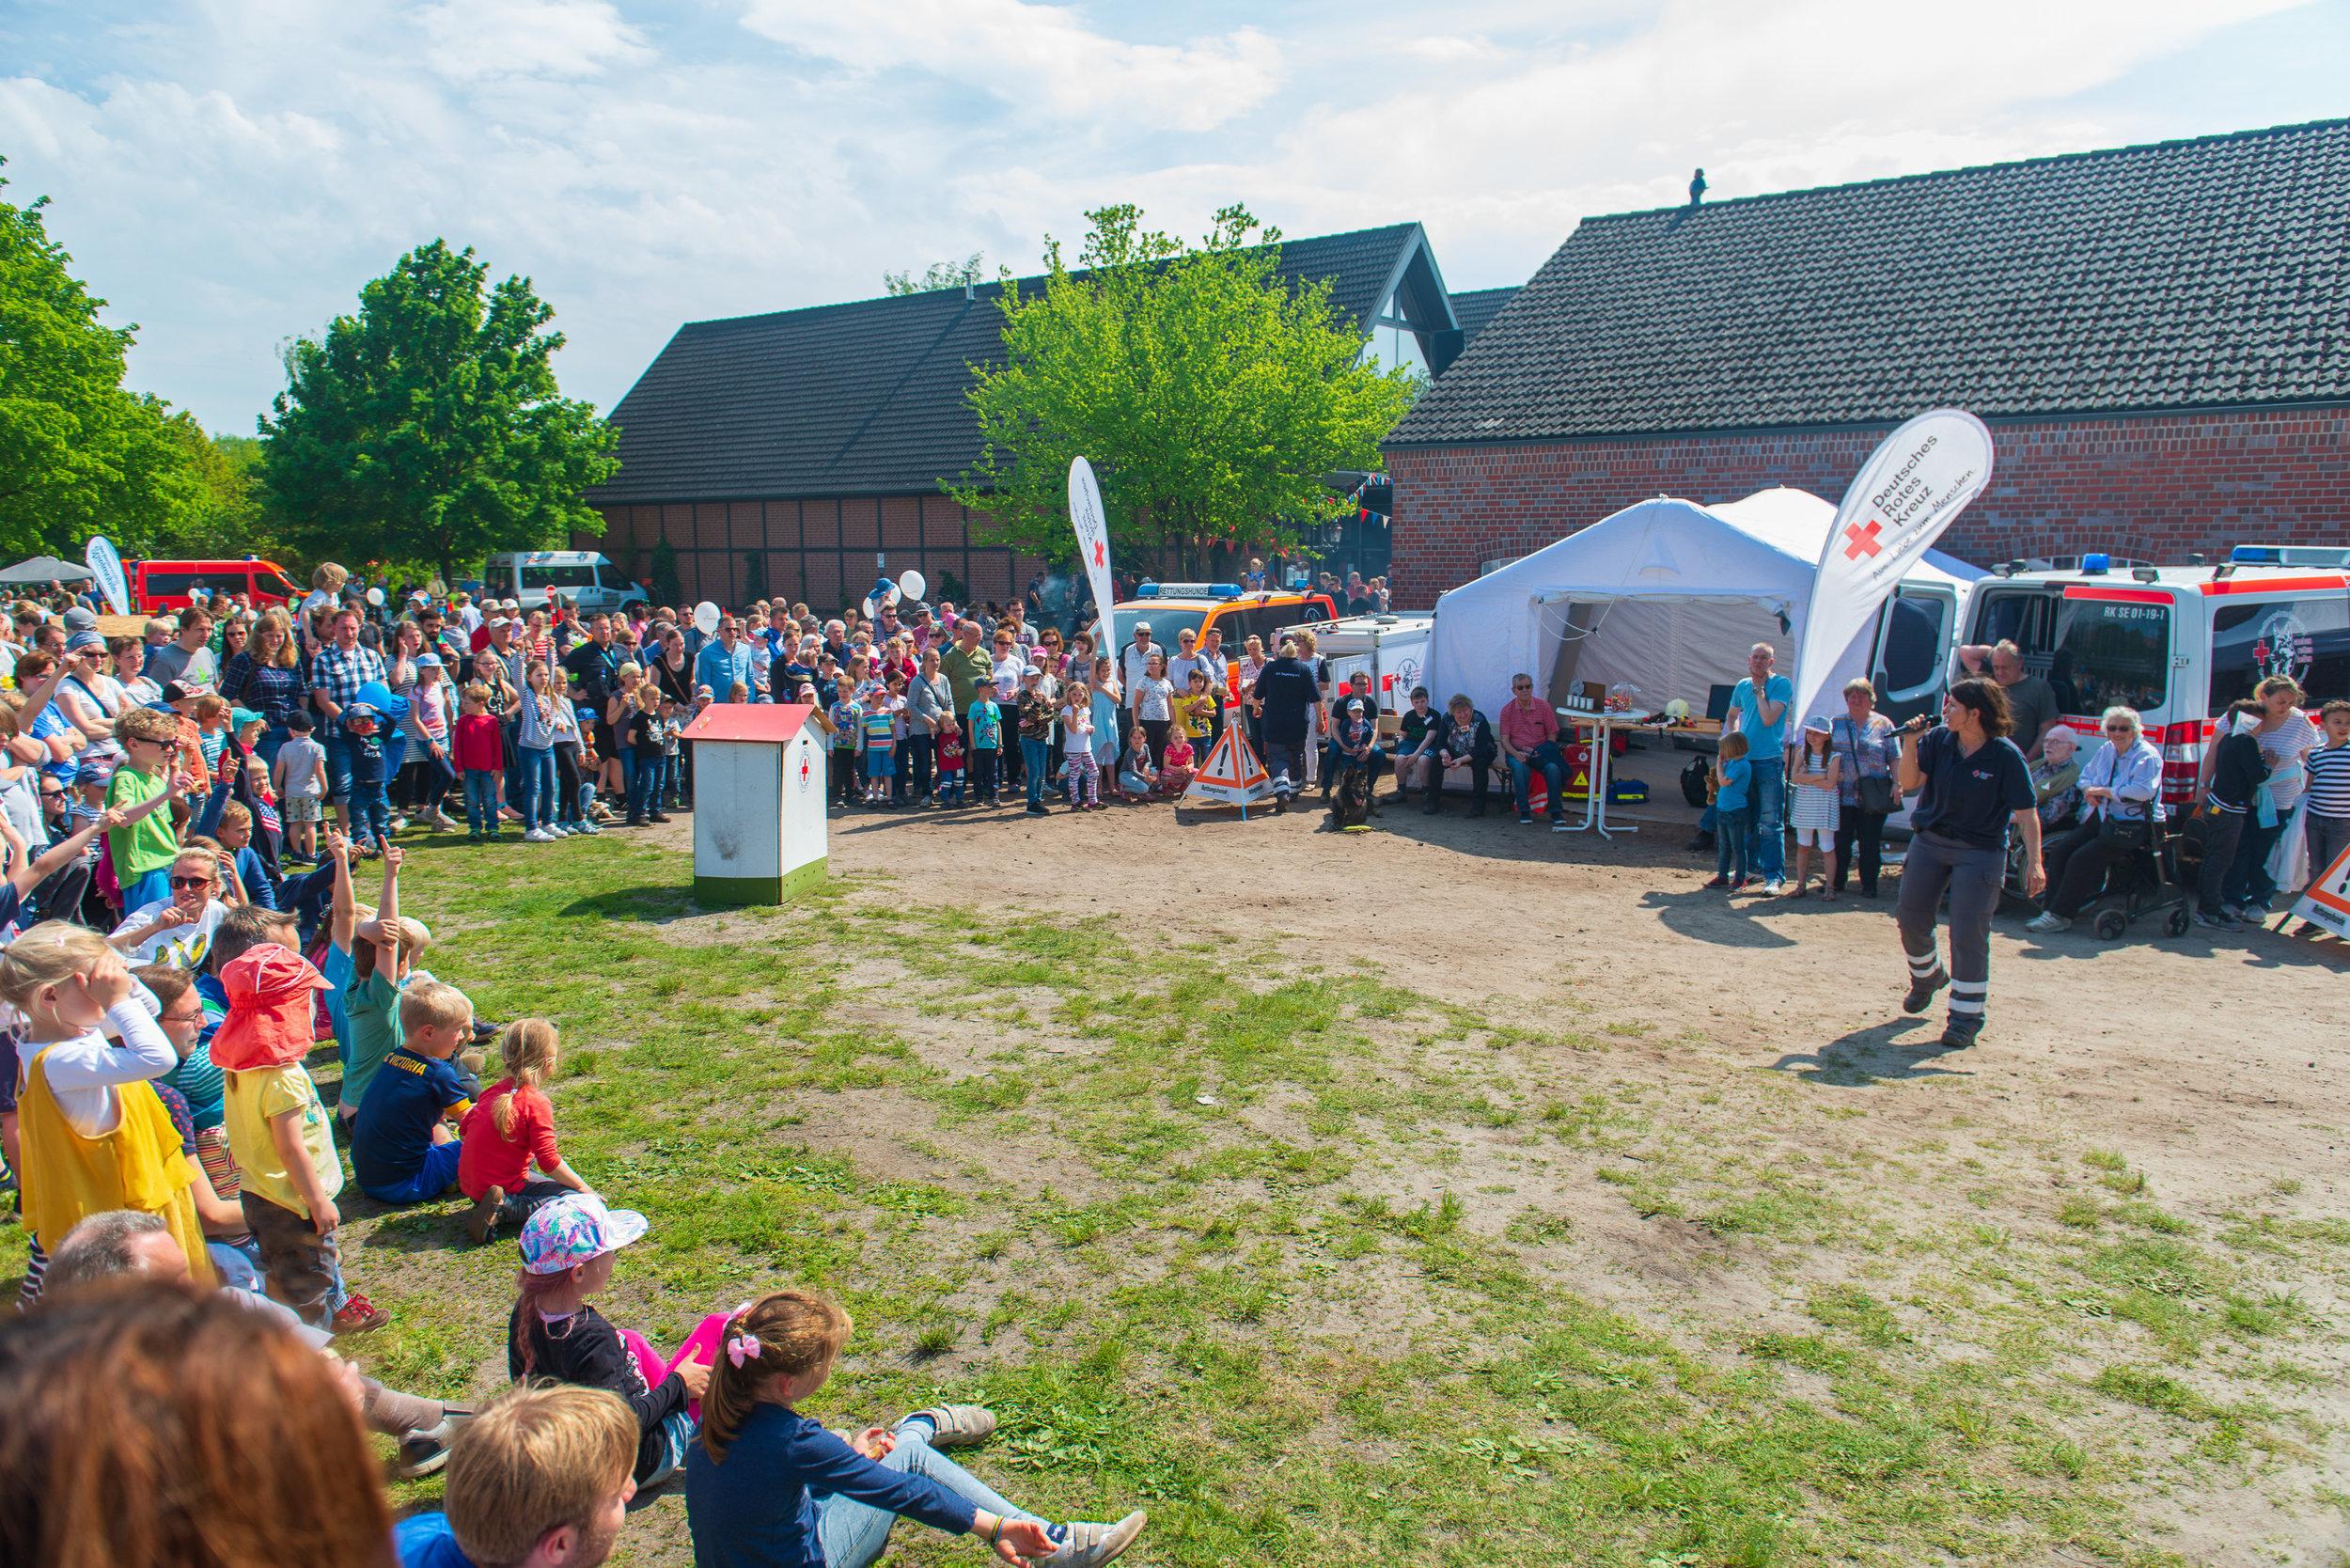 13-Norderstedter-Museumsfest-2019-FWM--XO-Dennys-Mamero-WEB-22.jpg